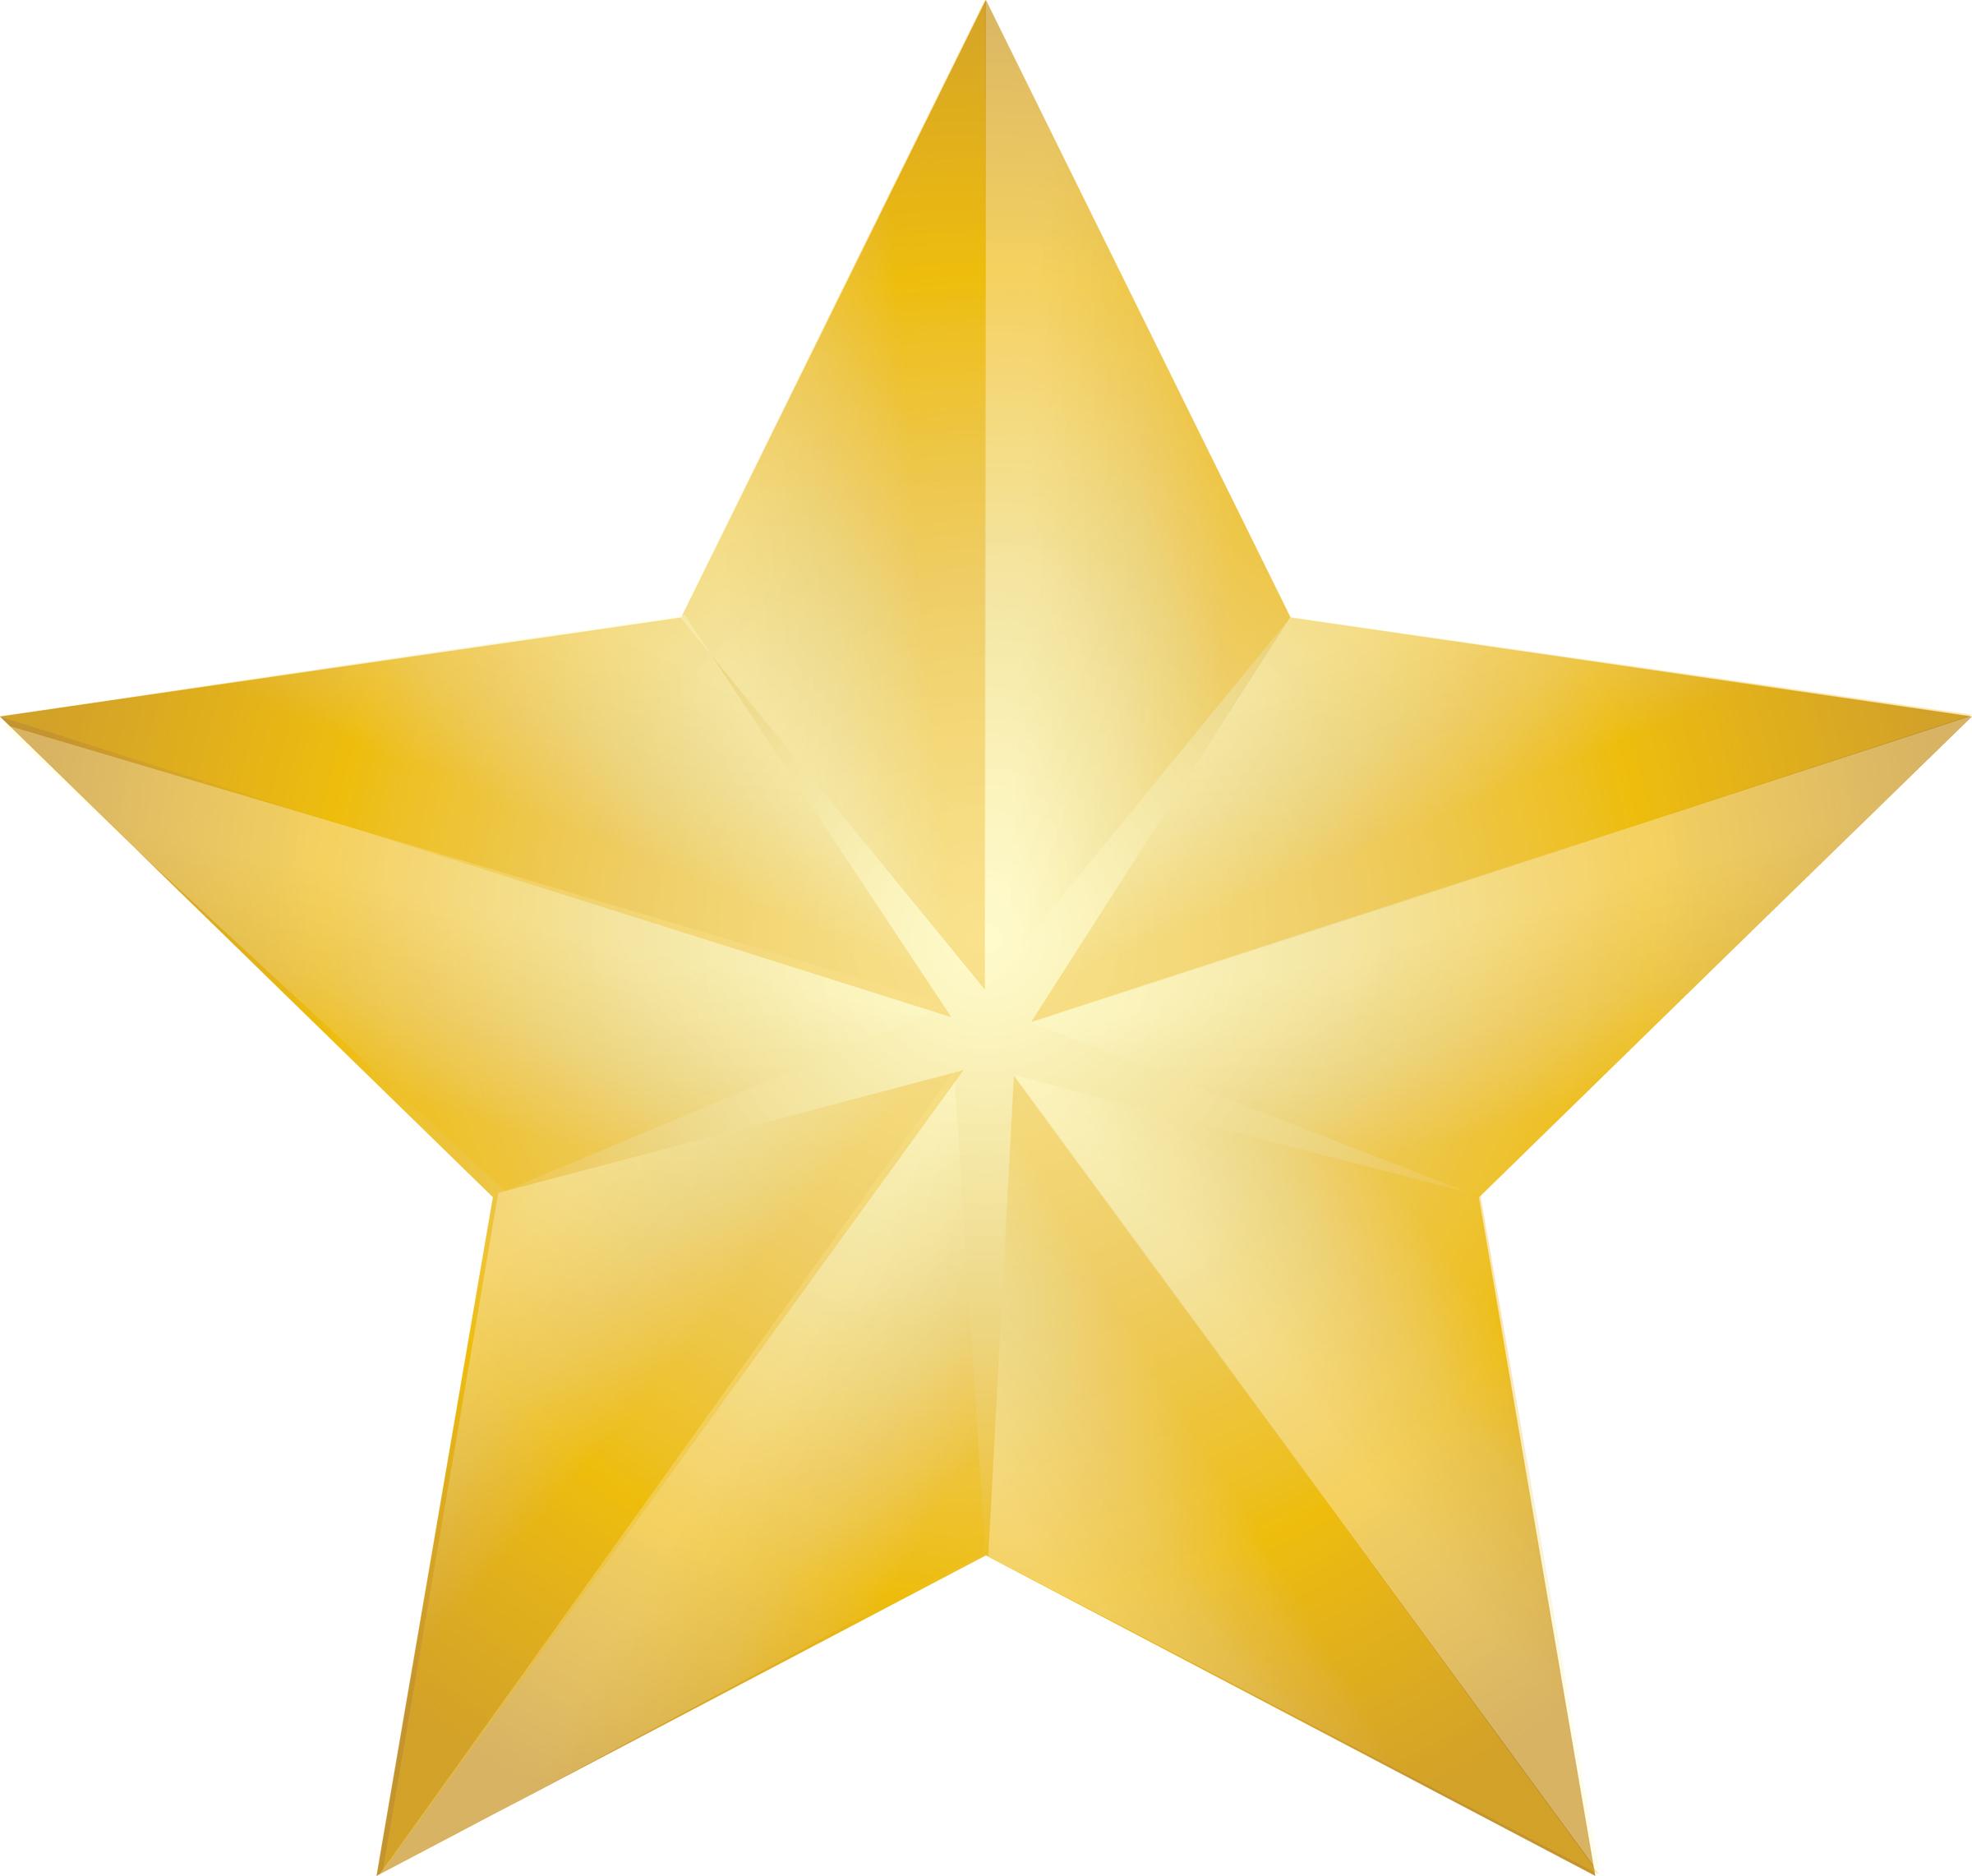 vector Free award cliparts download. Awards clipart star.